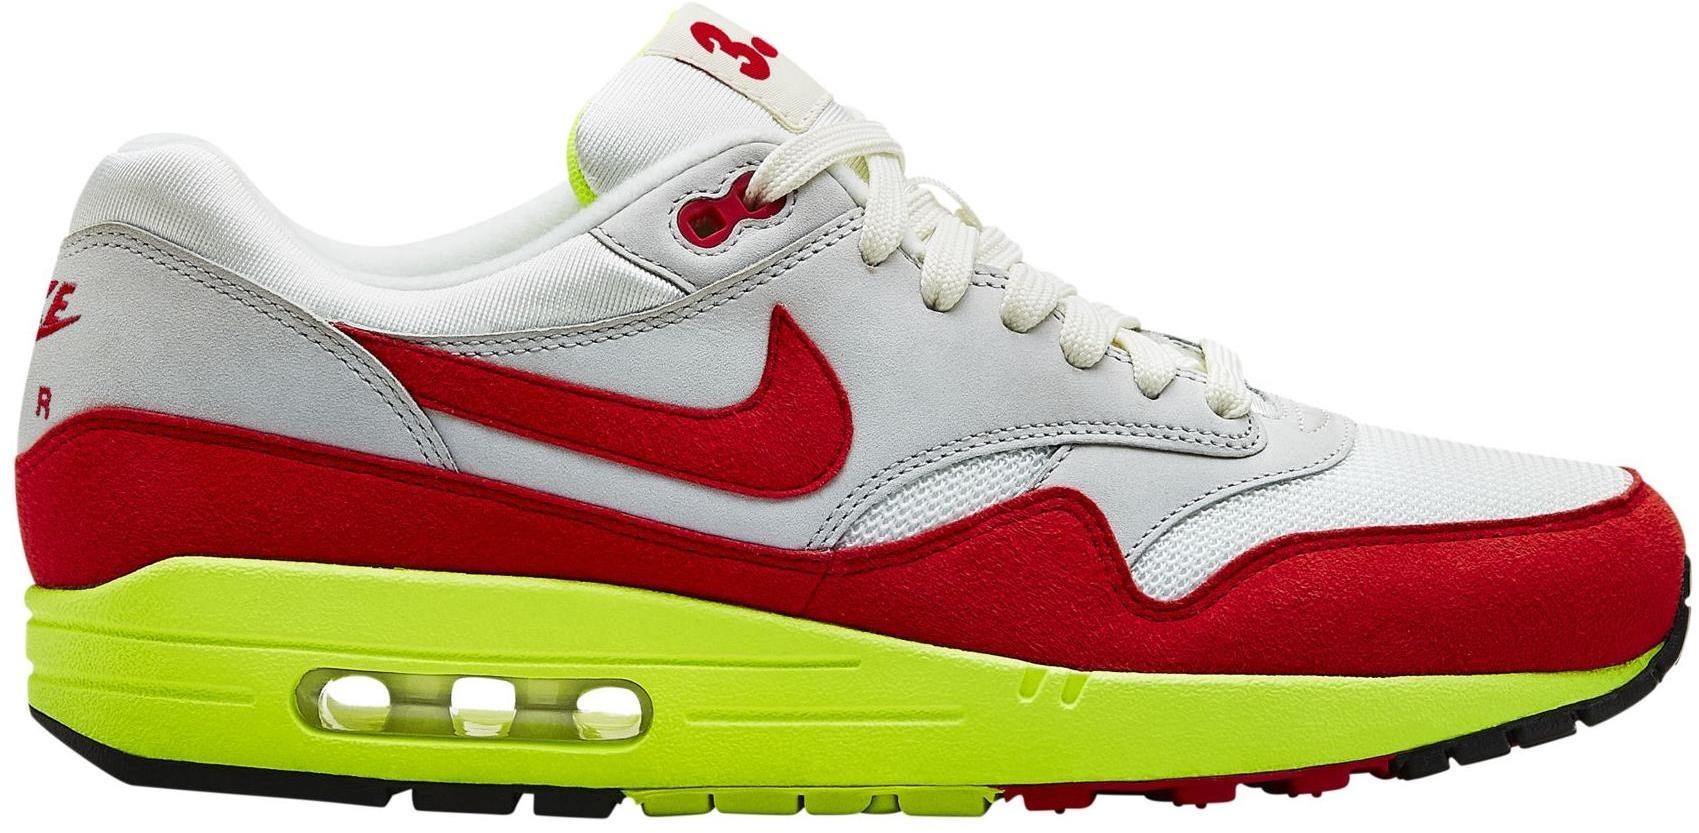 Nike Air Max 1 Air Max Day 3.26